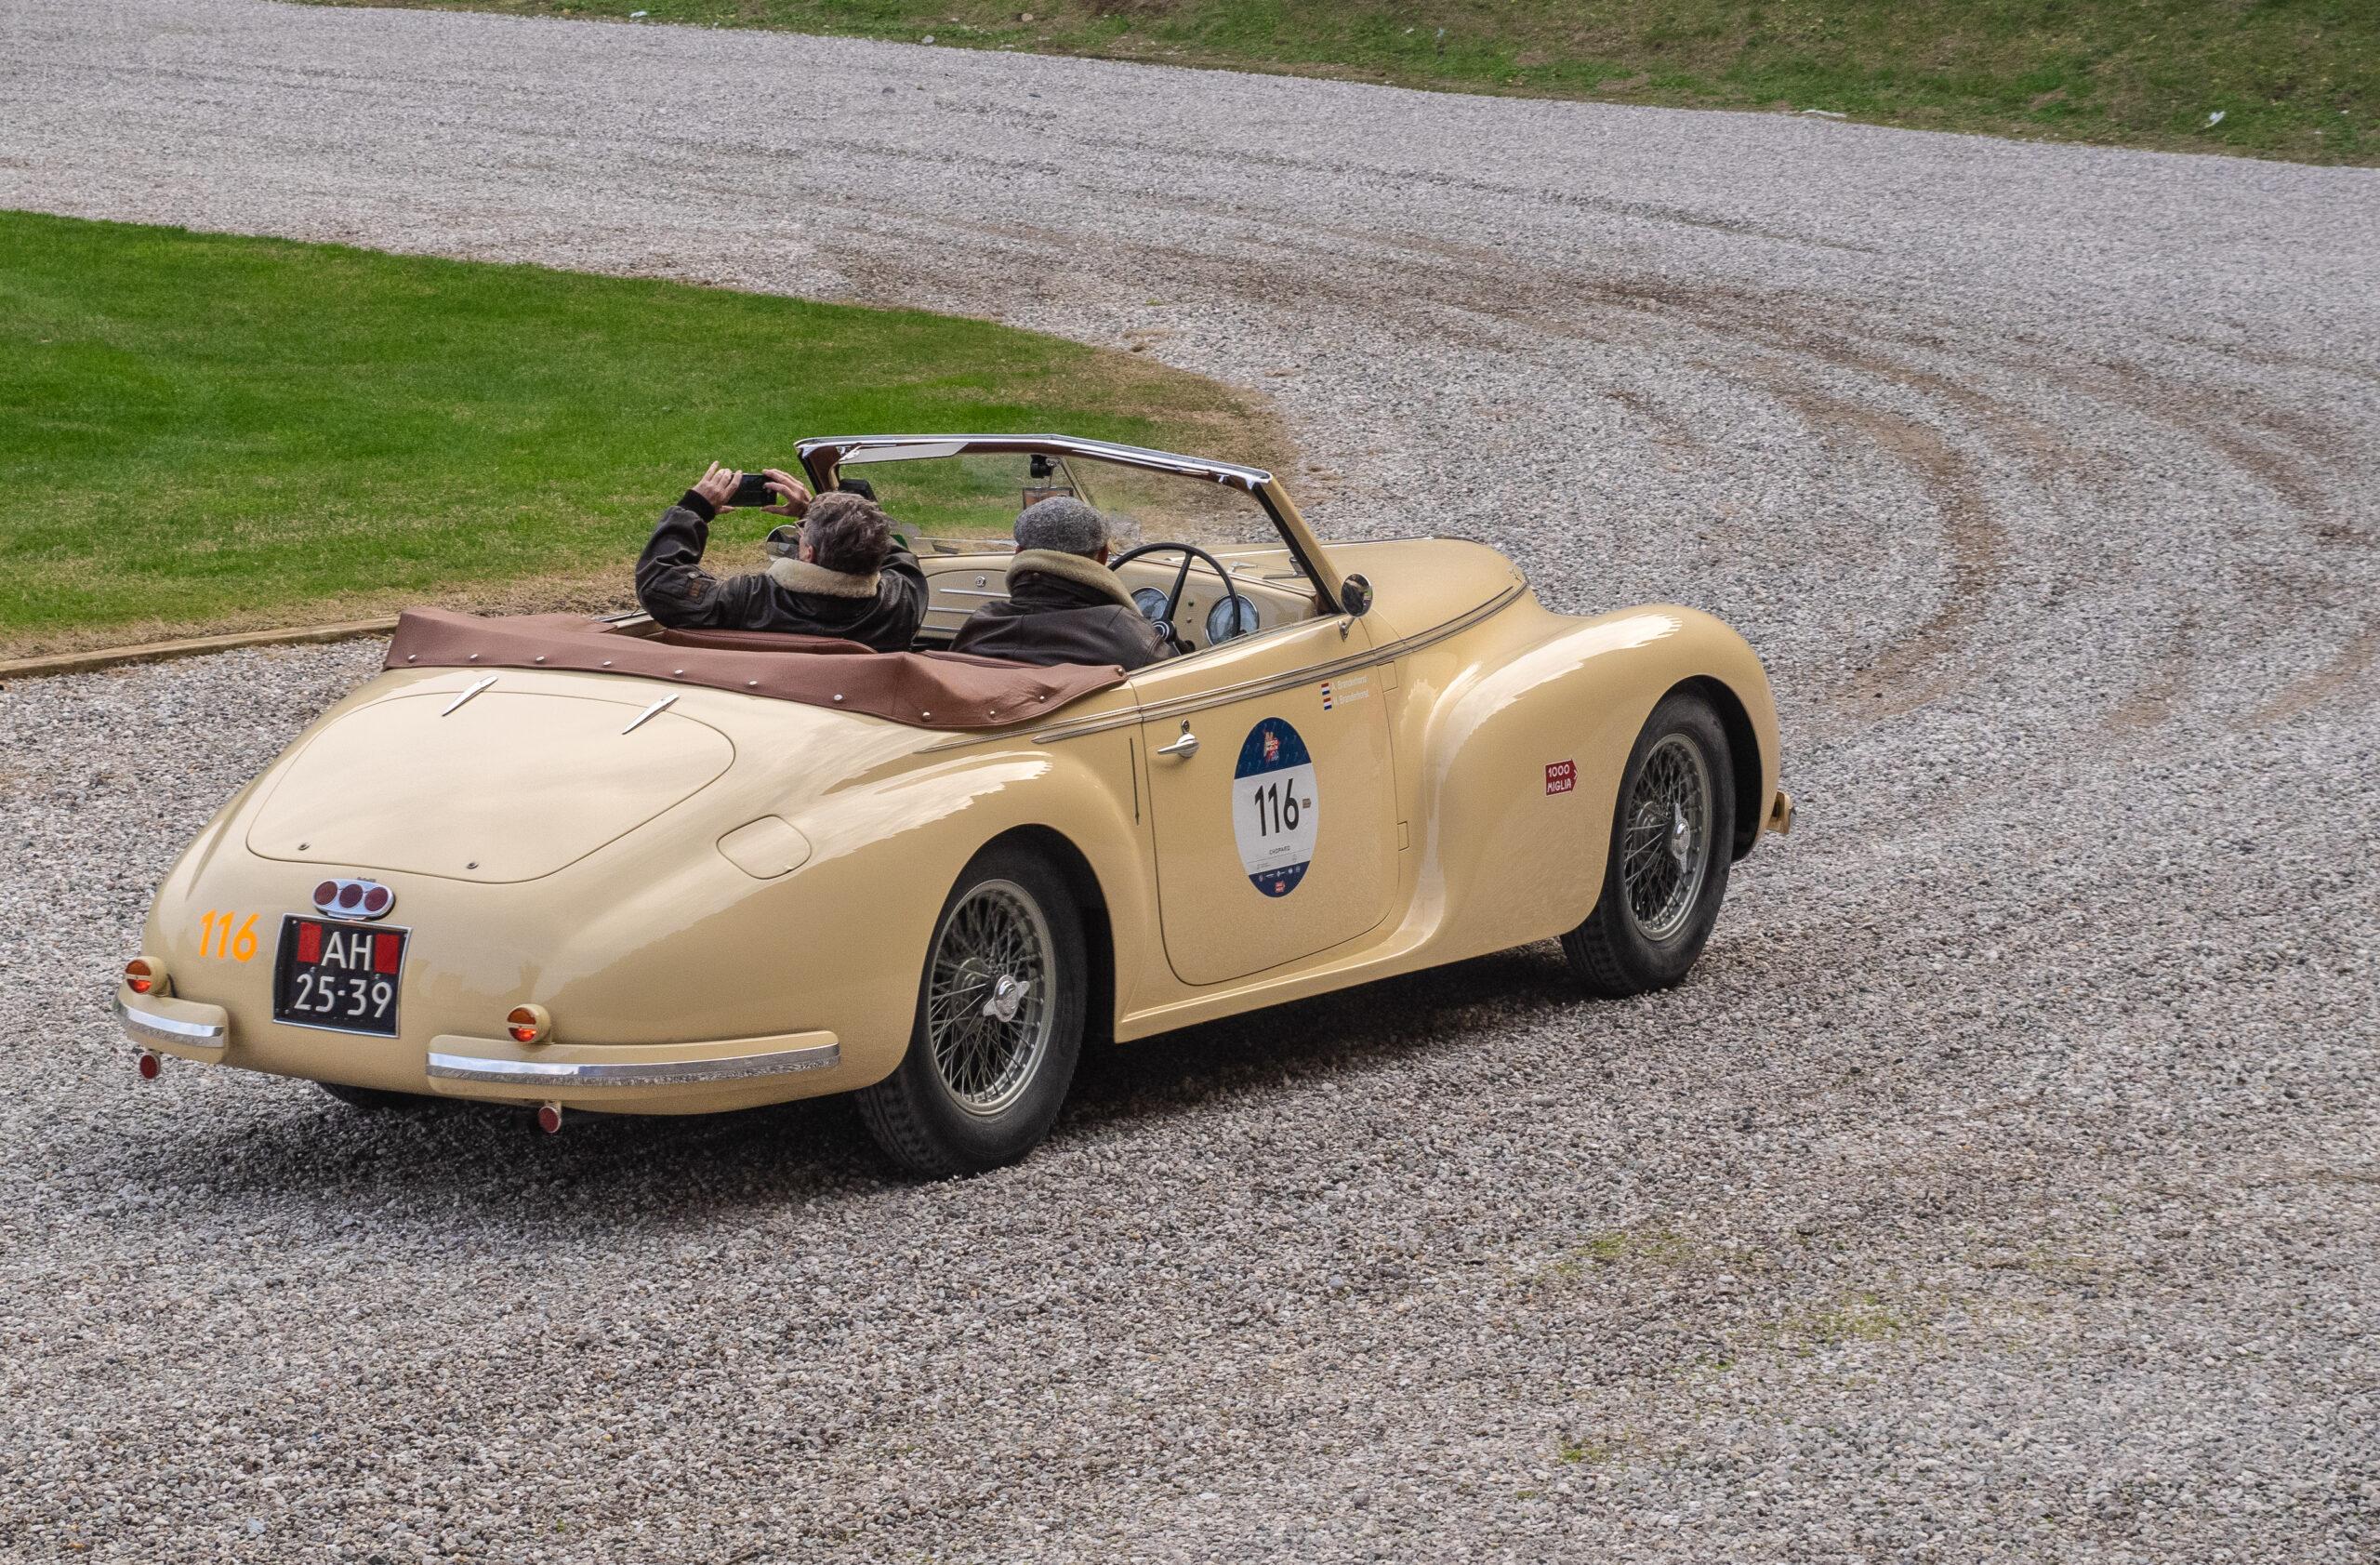 Mille-Miglia-2020-Alfa-Romeo-2500-SS-Cabriolet-italianedacorsa